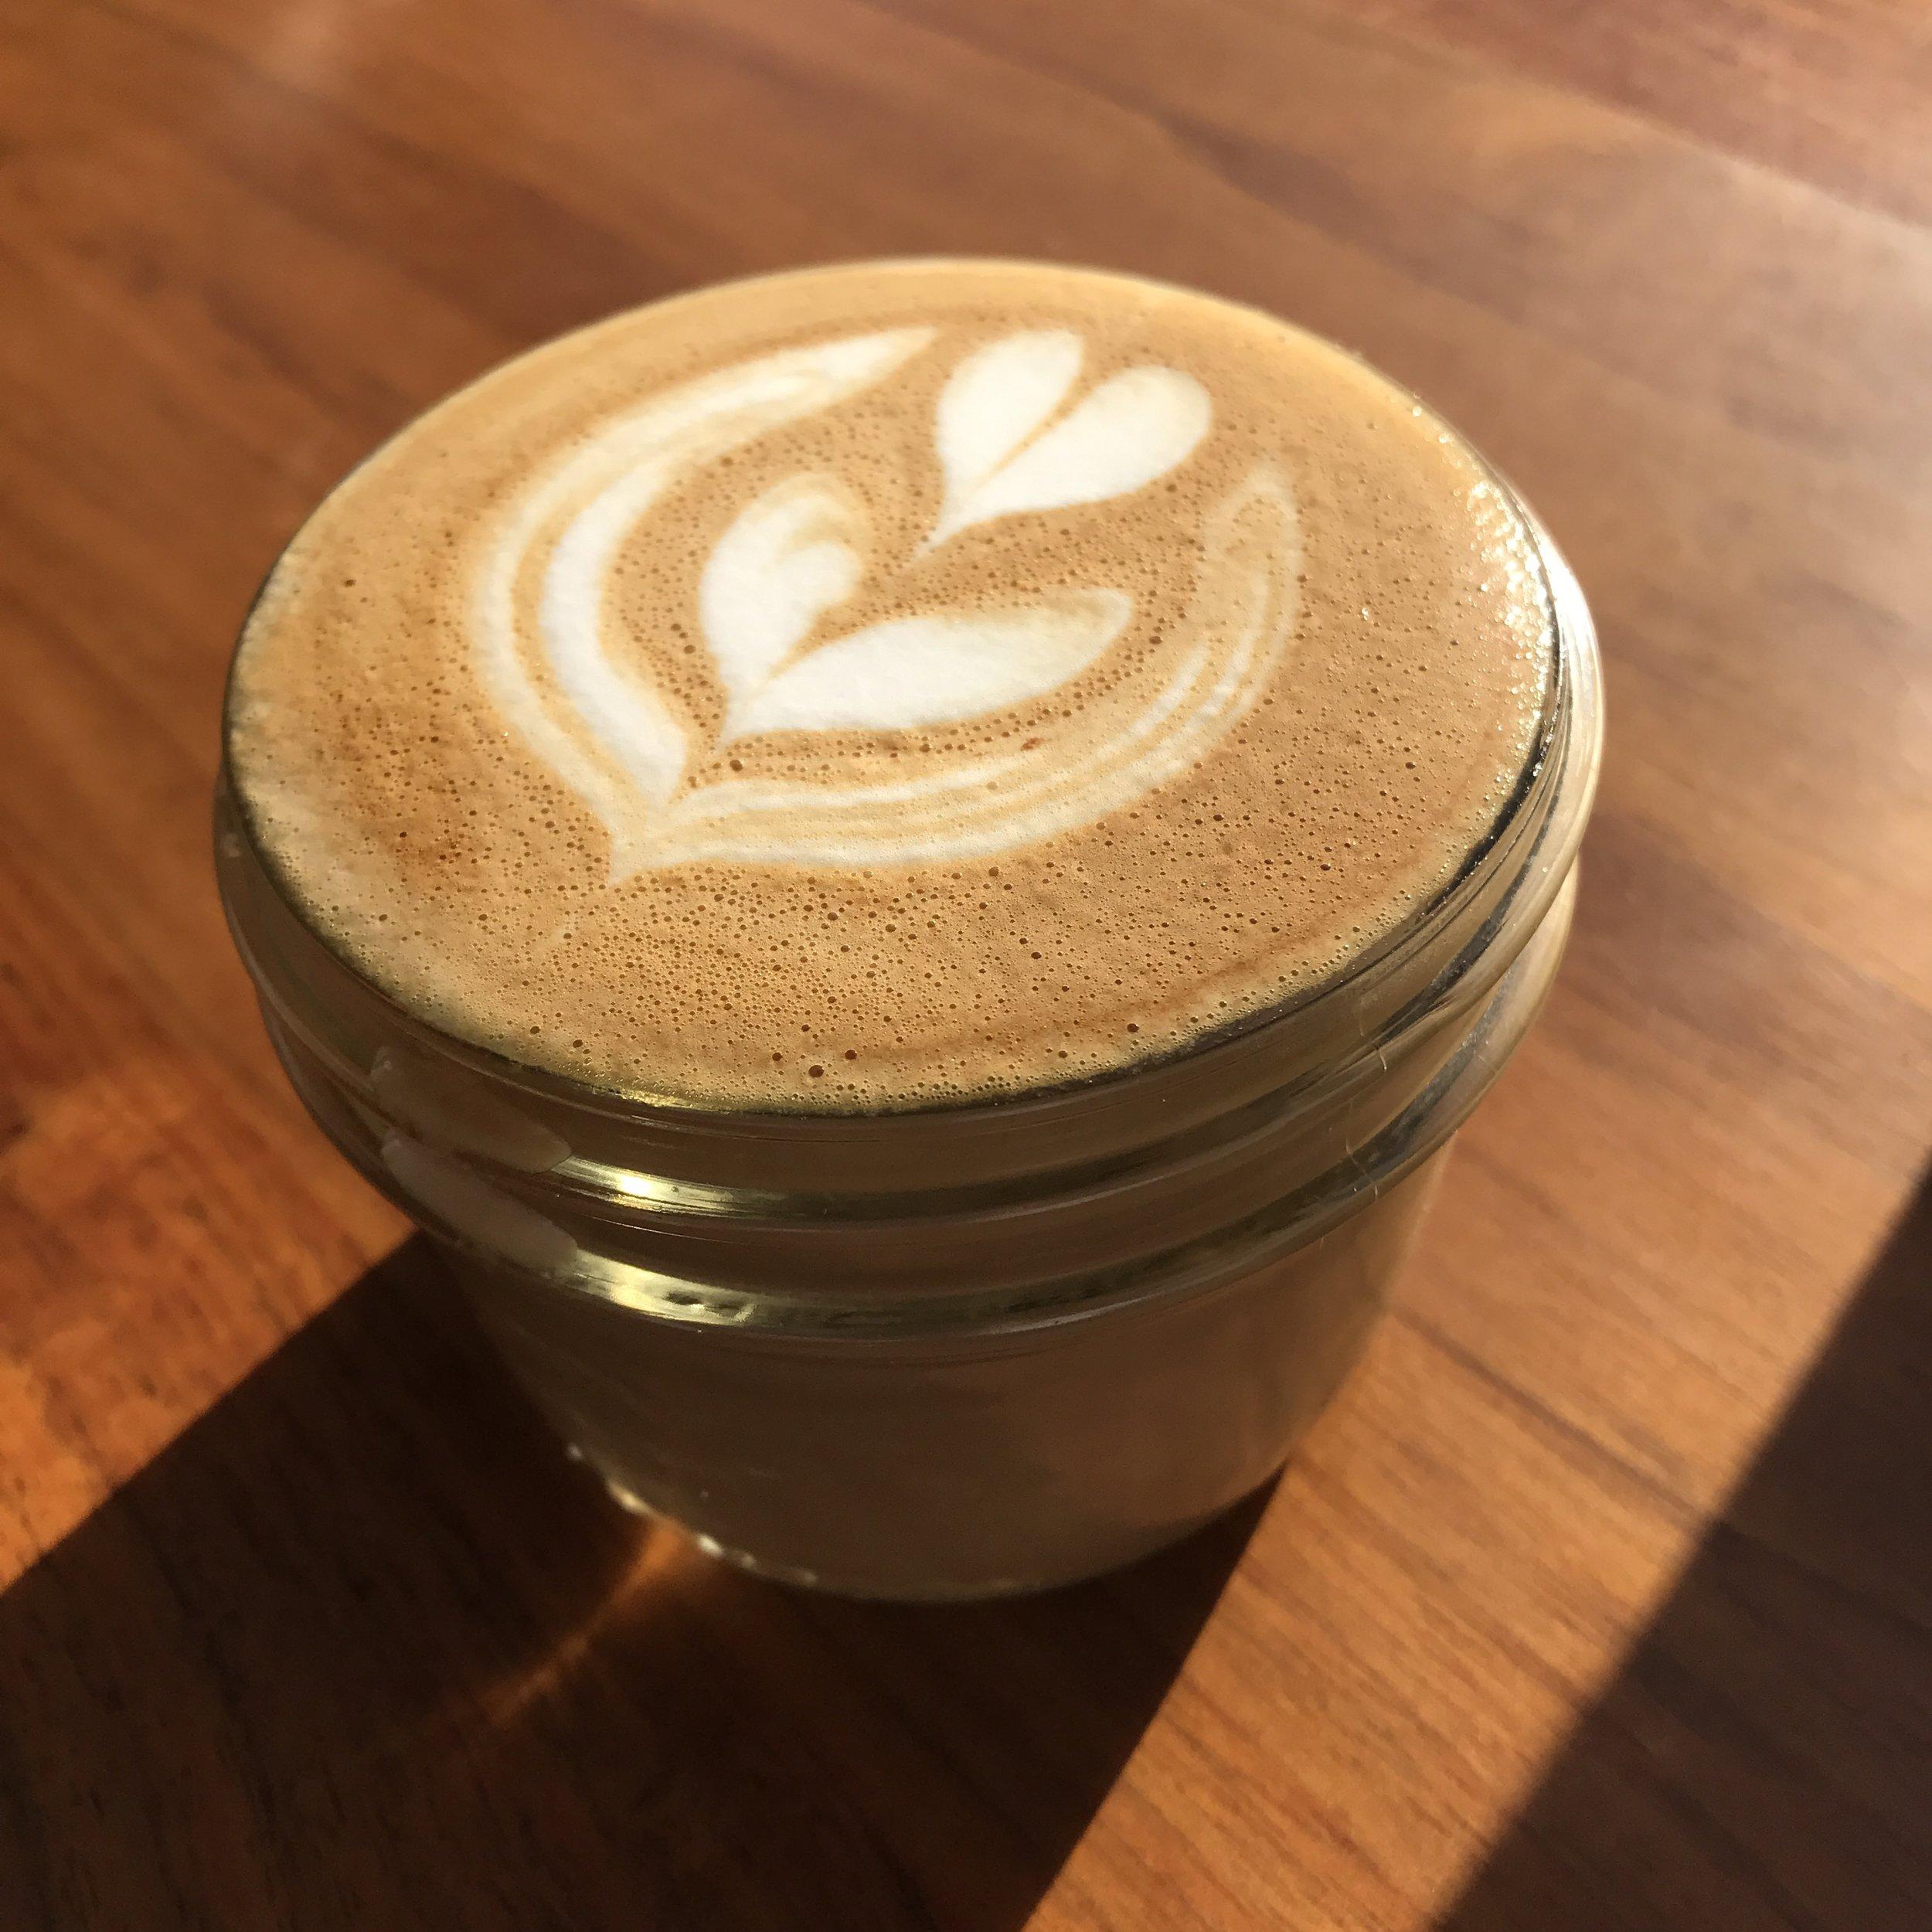 COURIER COFFEE, PORTLAND, OREGON